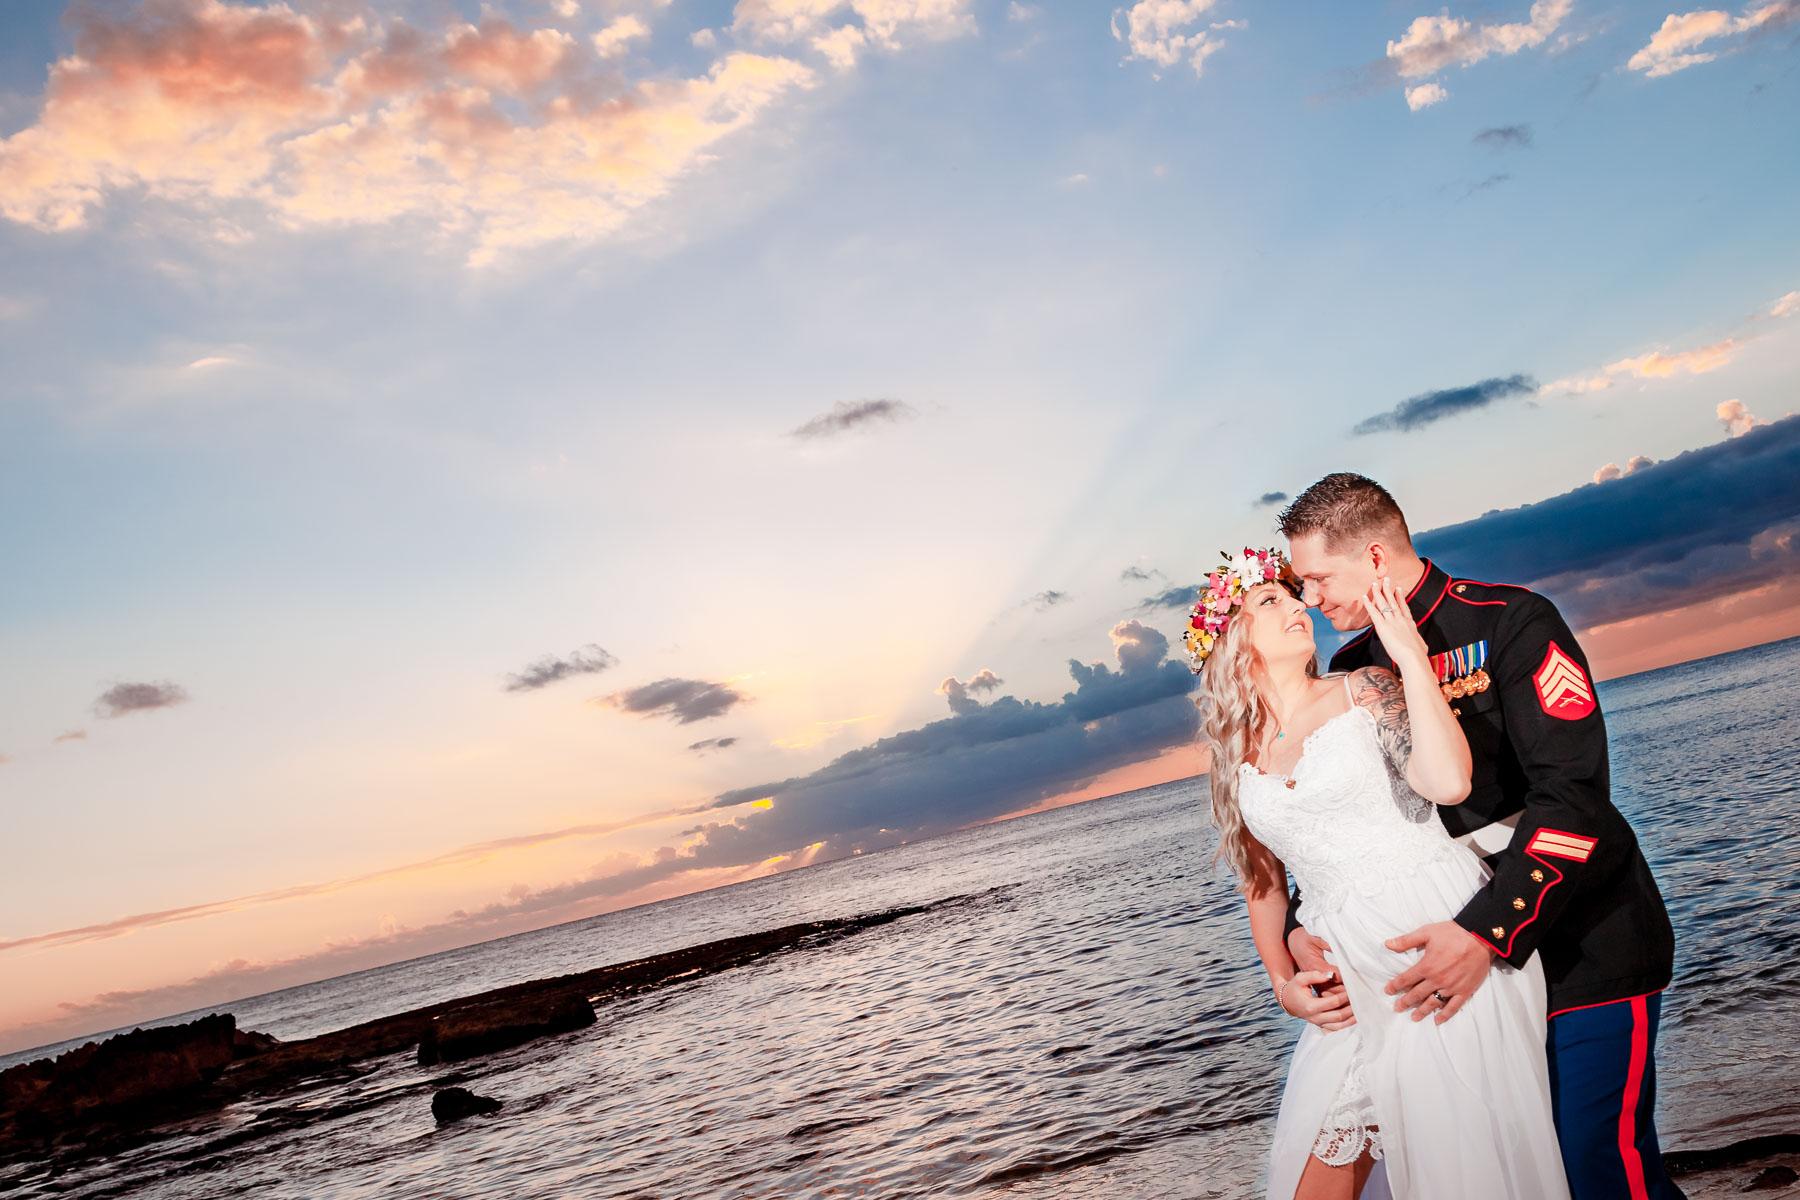 sunset beach bridal wedding photo oahu hi